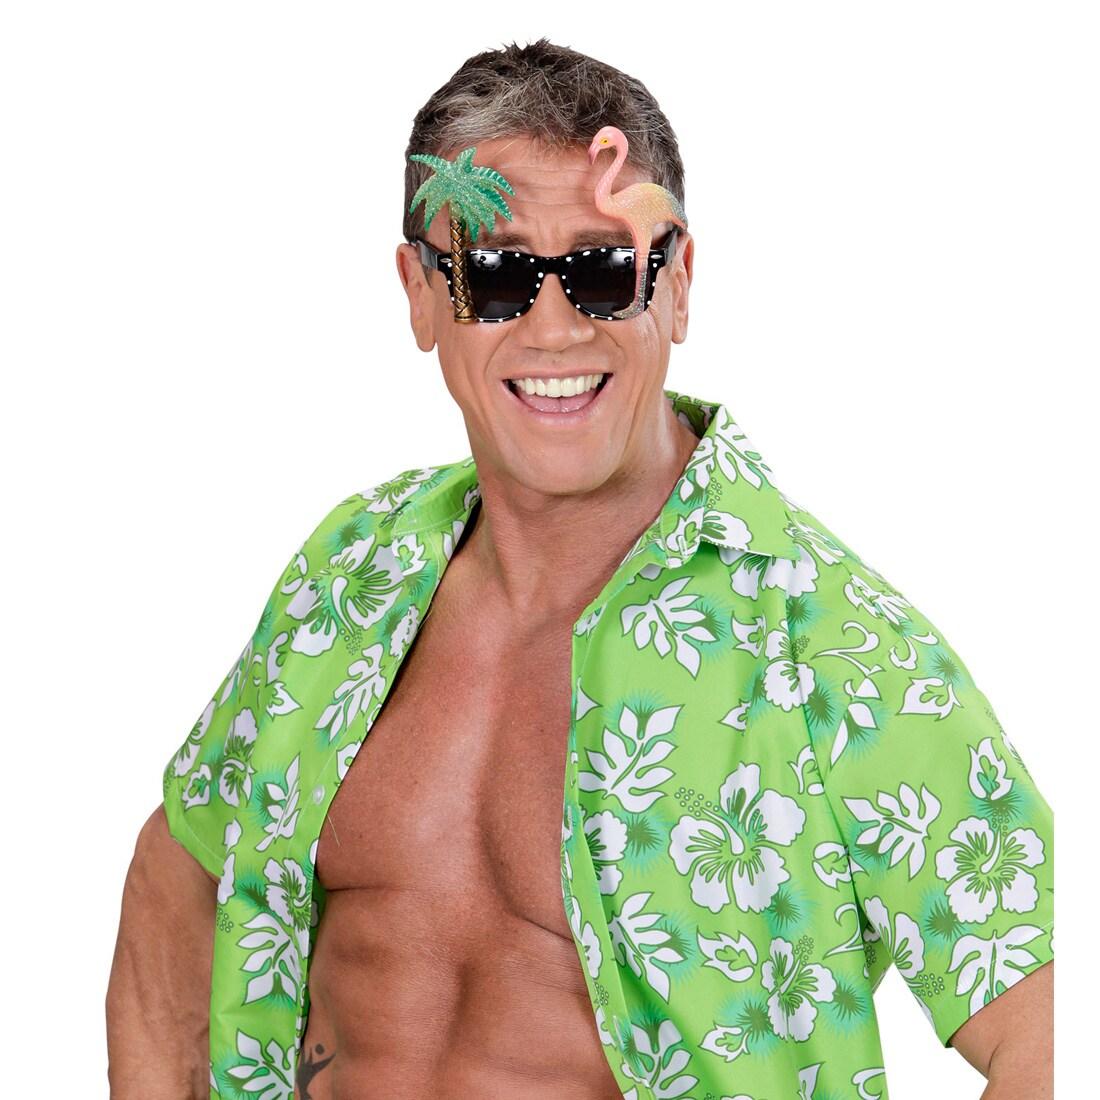 Flamingo Brille Damen Spaßbrille Beach Party pink Partybrille Karibik Sommer